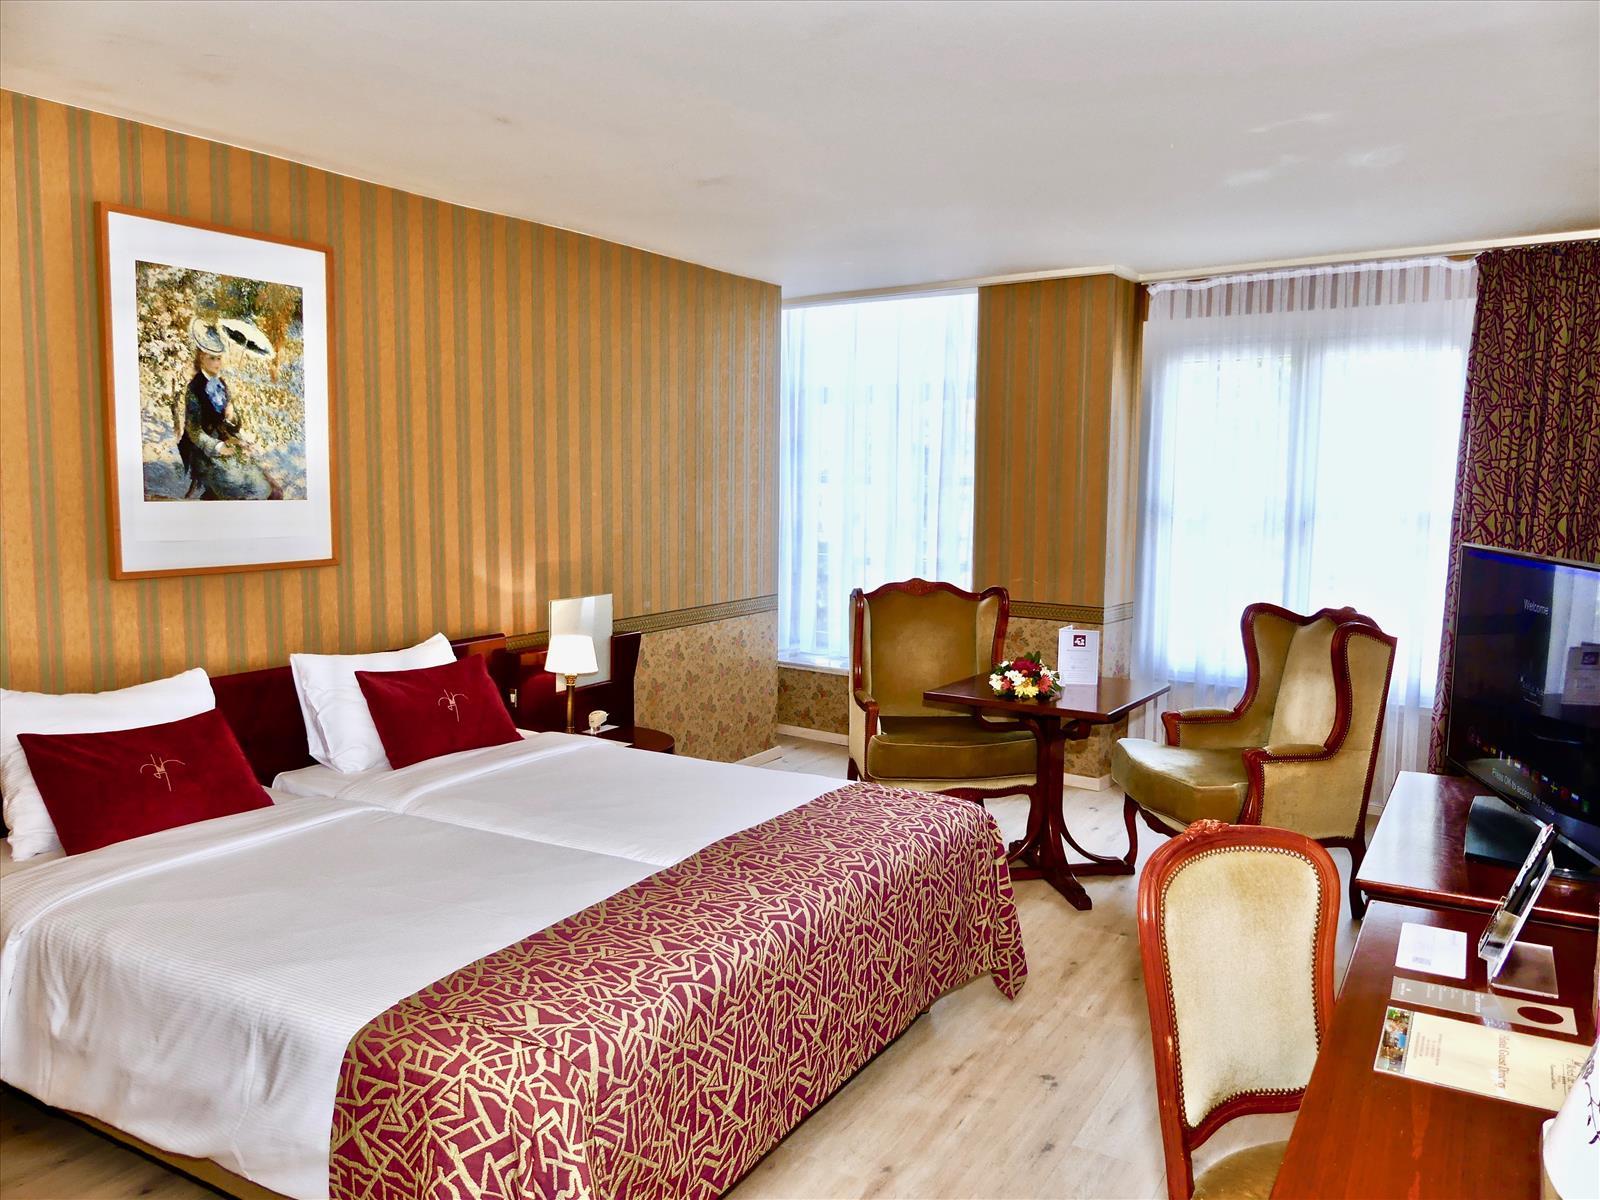 golden-tulip-hotel-de-medici thumbnail